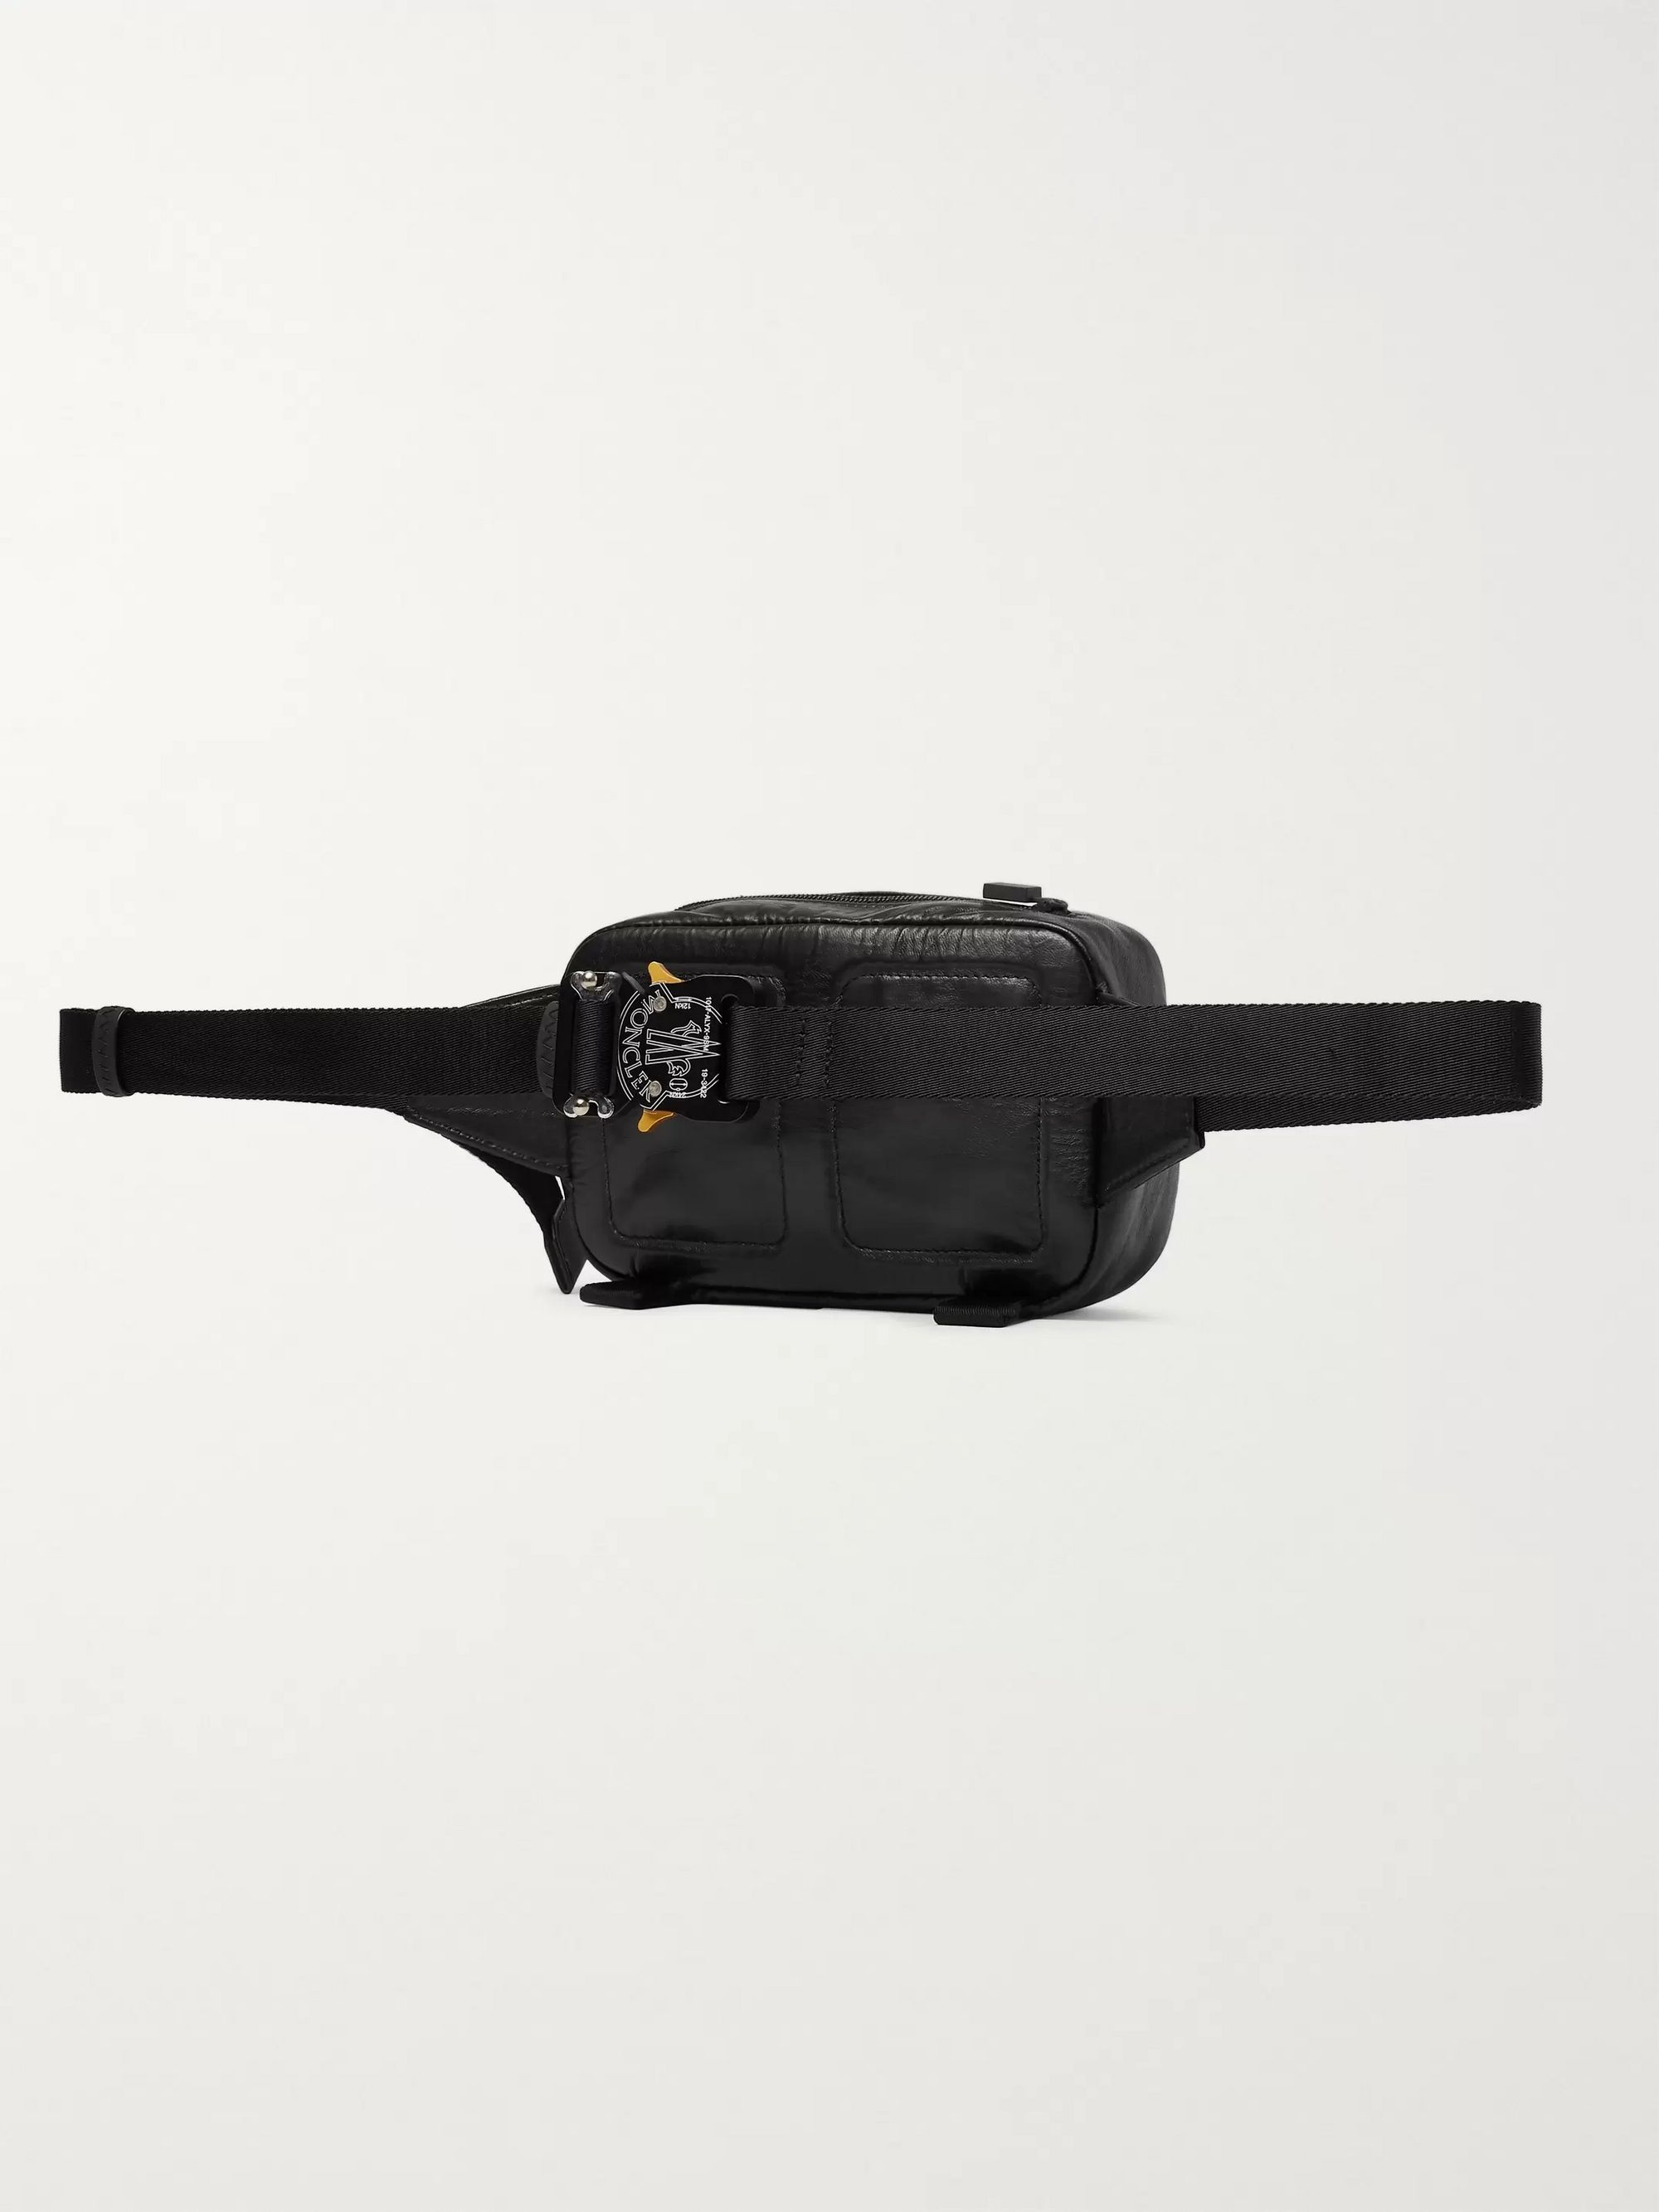 Black 6 Moncler 1017 Alyx 9sm Leather Belt Bag   Genius